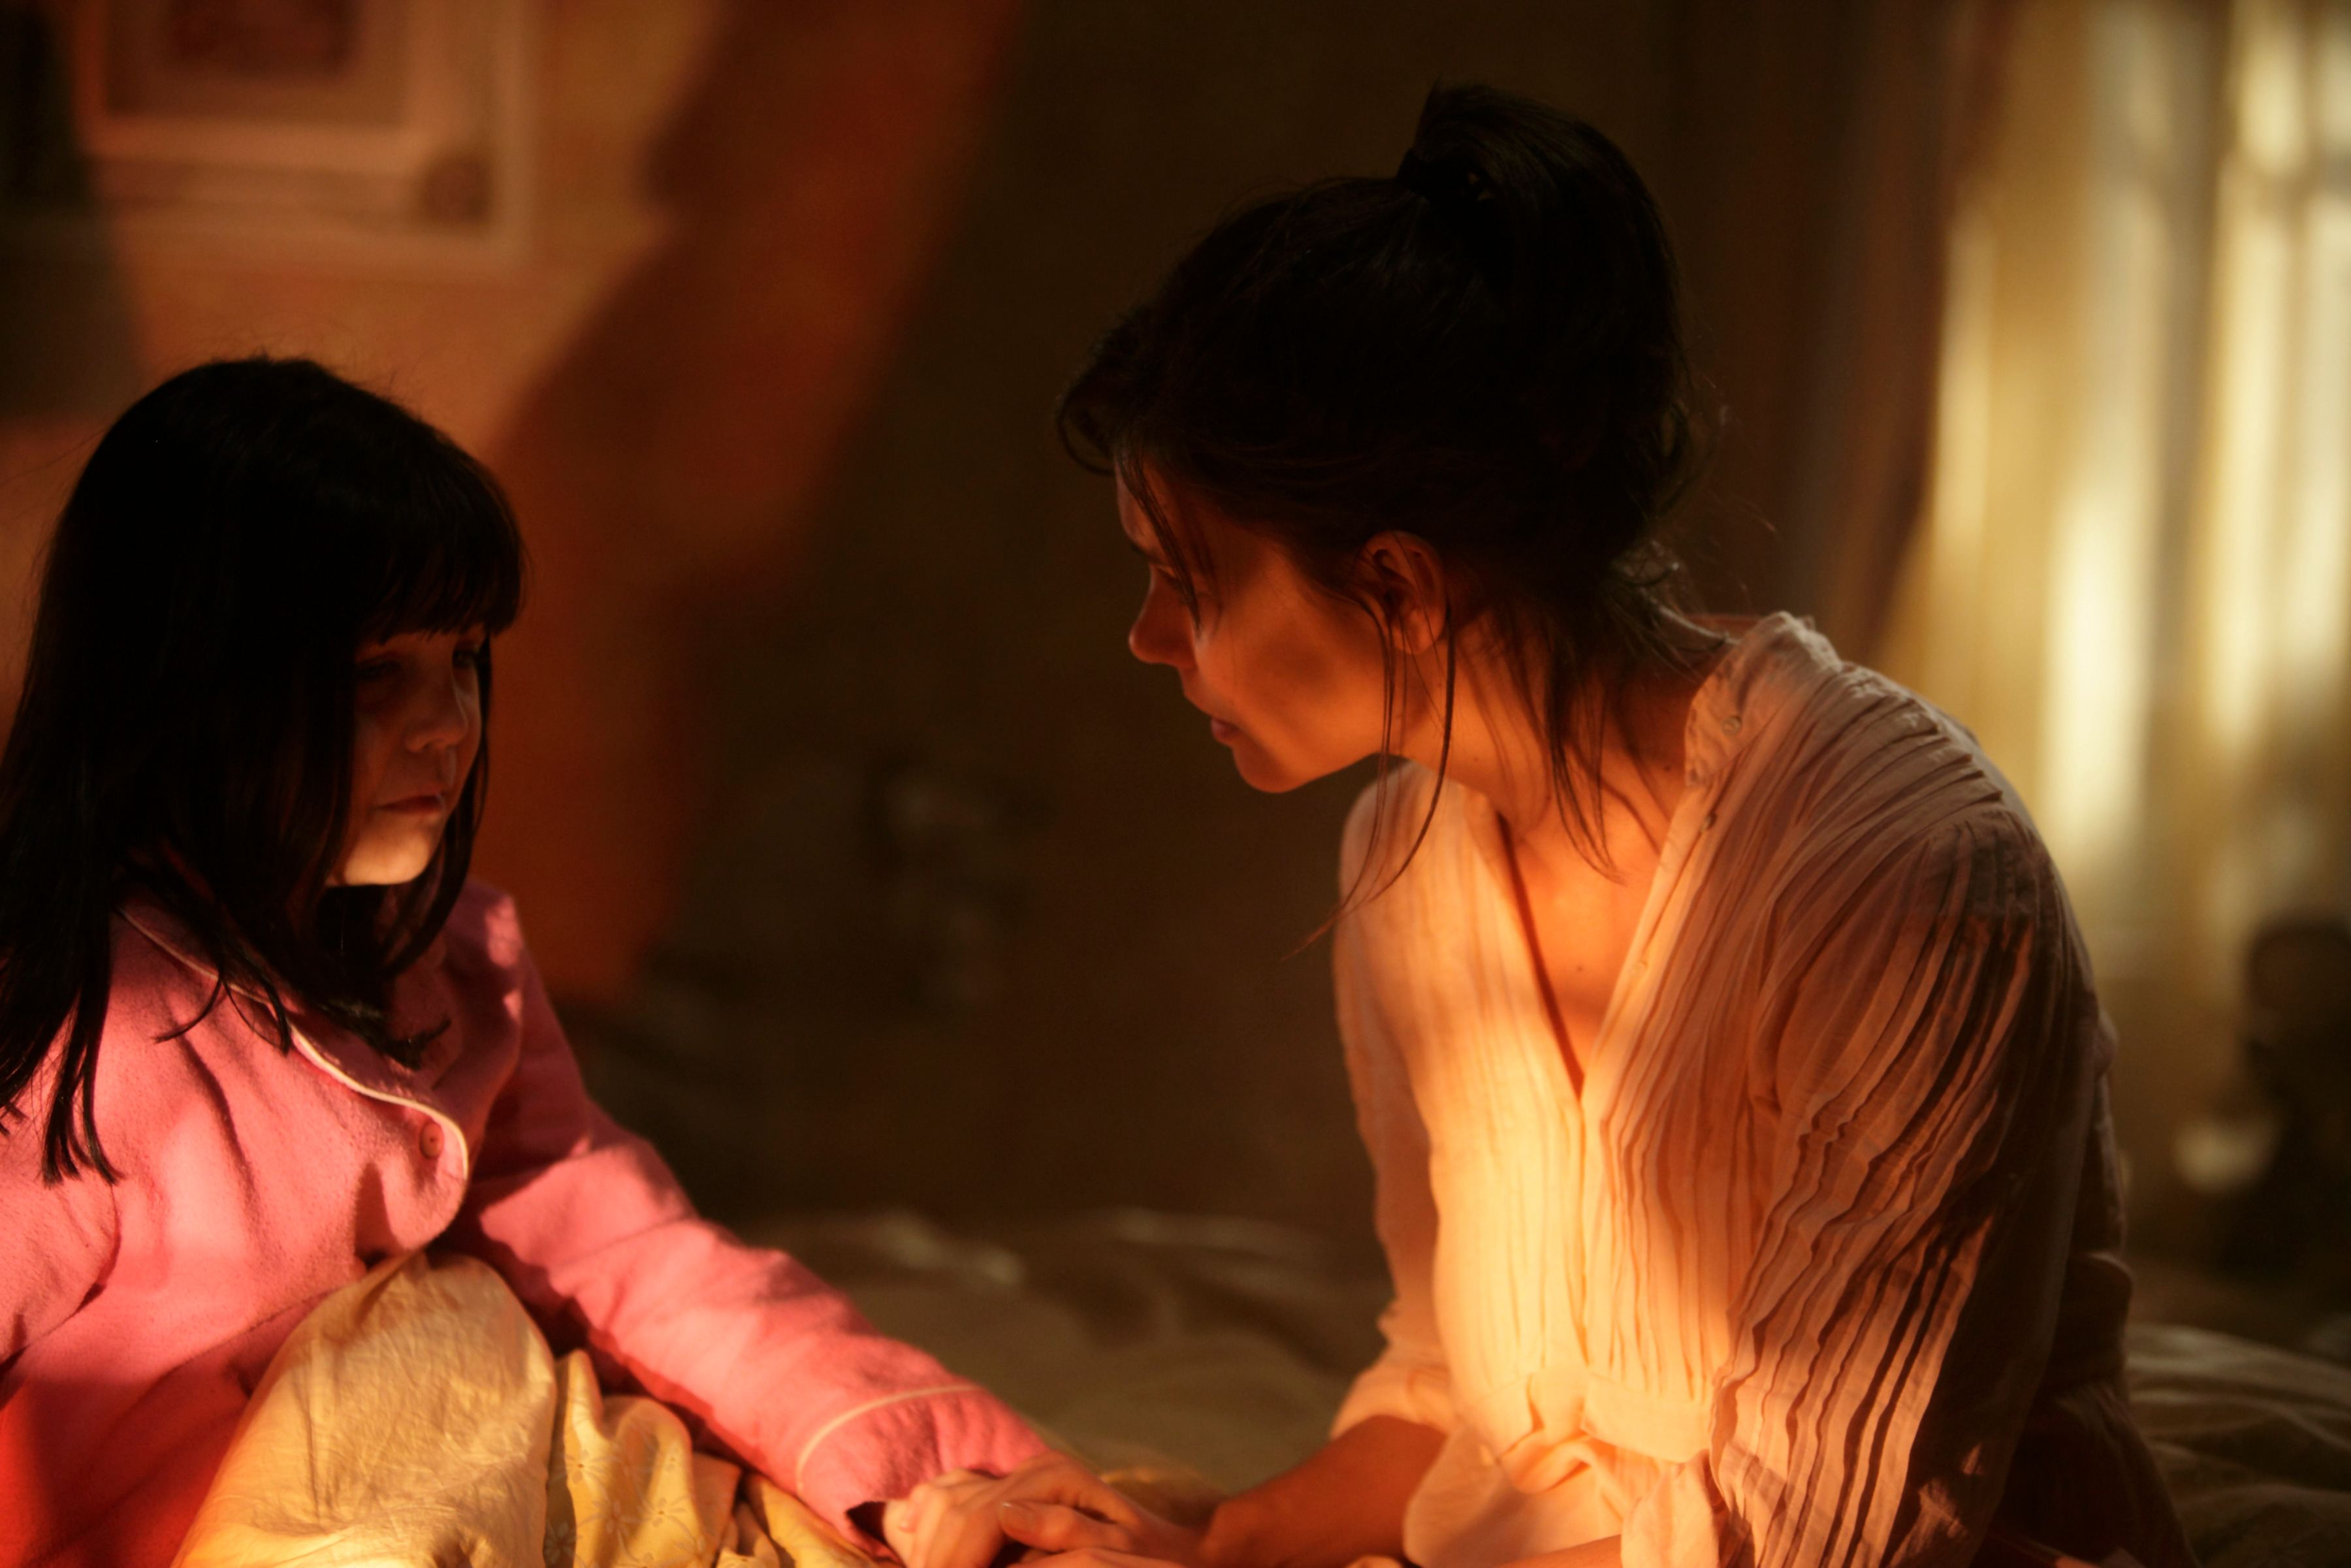 кадры из фильма Не бойся темноты Бэйли Мэдисон, Кэти Холмс,